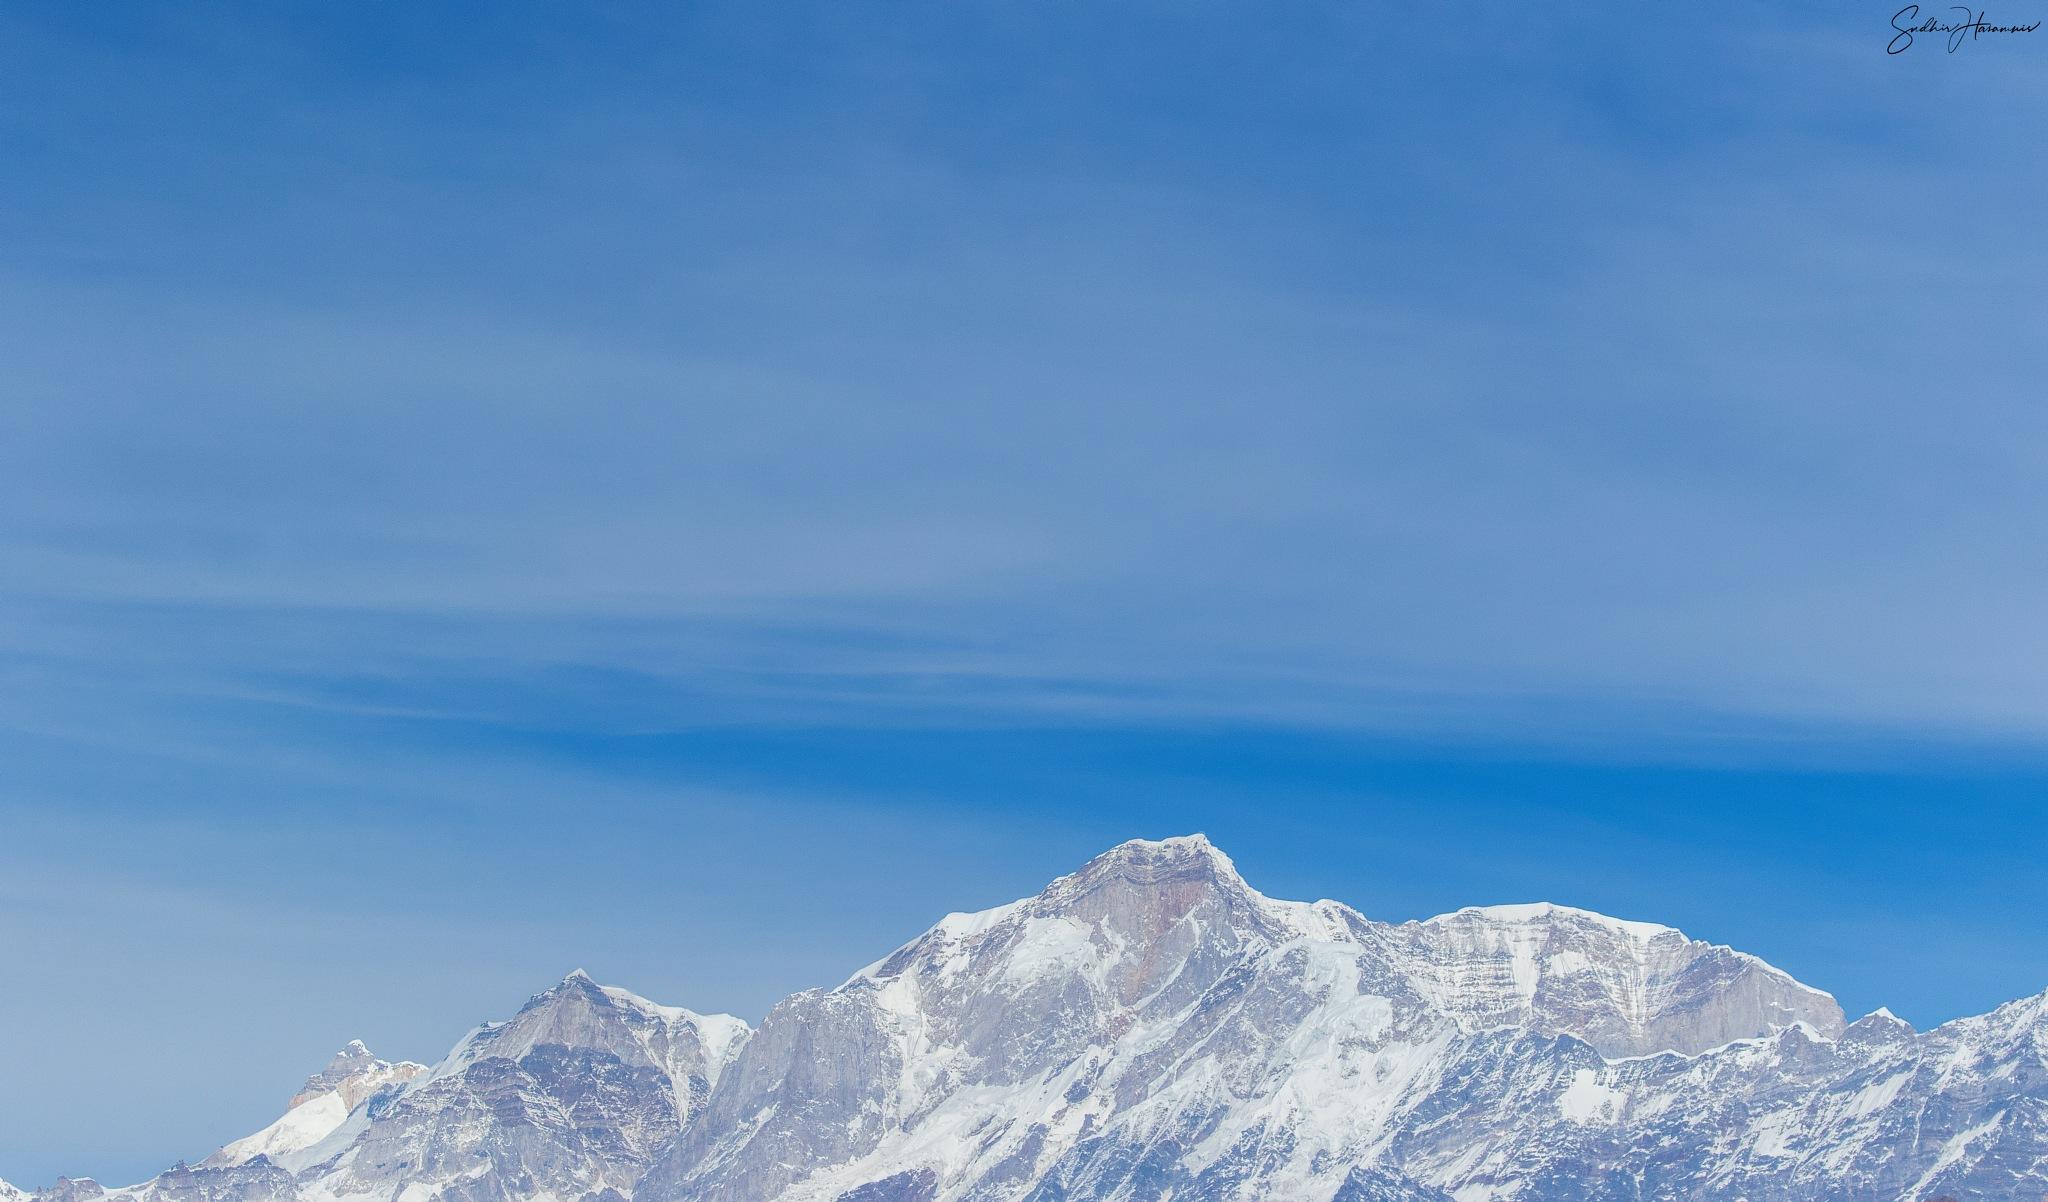 Early morning at Himalayas by DrSudhir Hasamnis